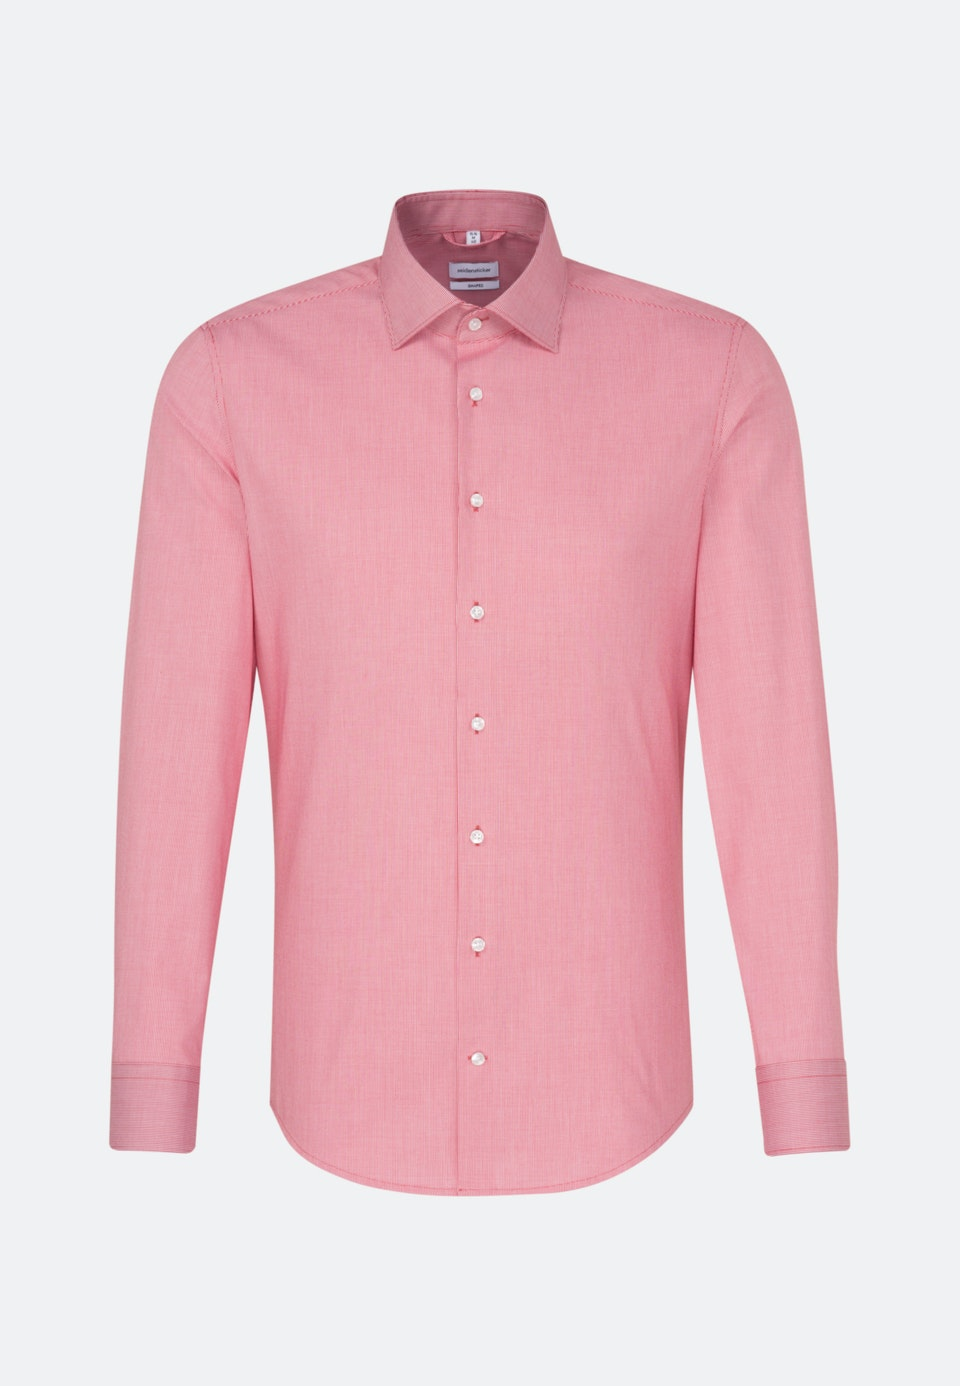 Non-iron Struktur Business Shirt in Shaped with Kent-Collar in Red |  Seidensticker Onlineshop